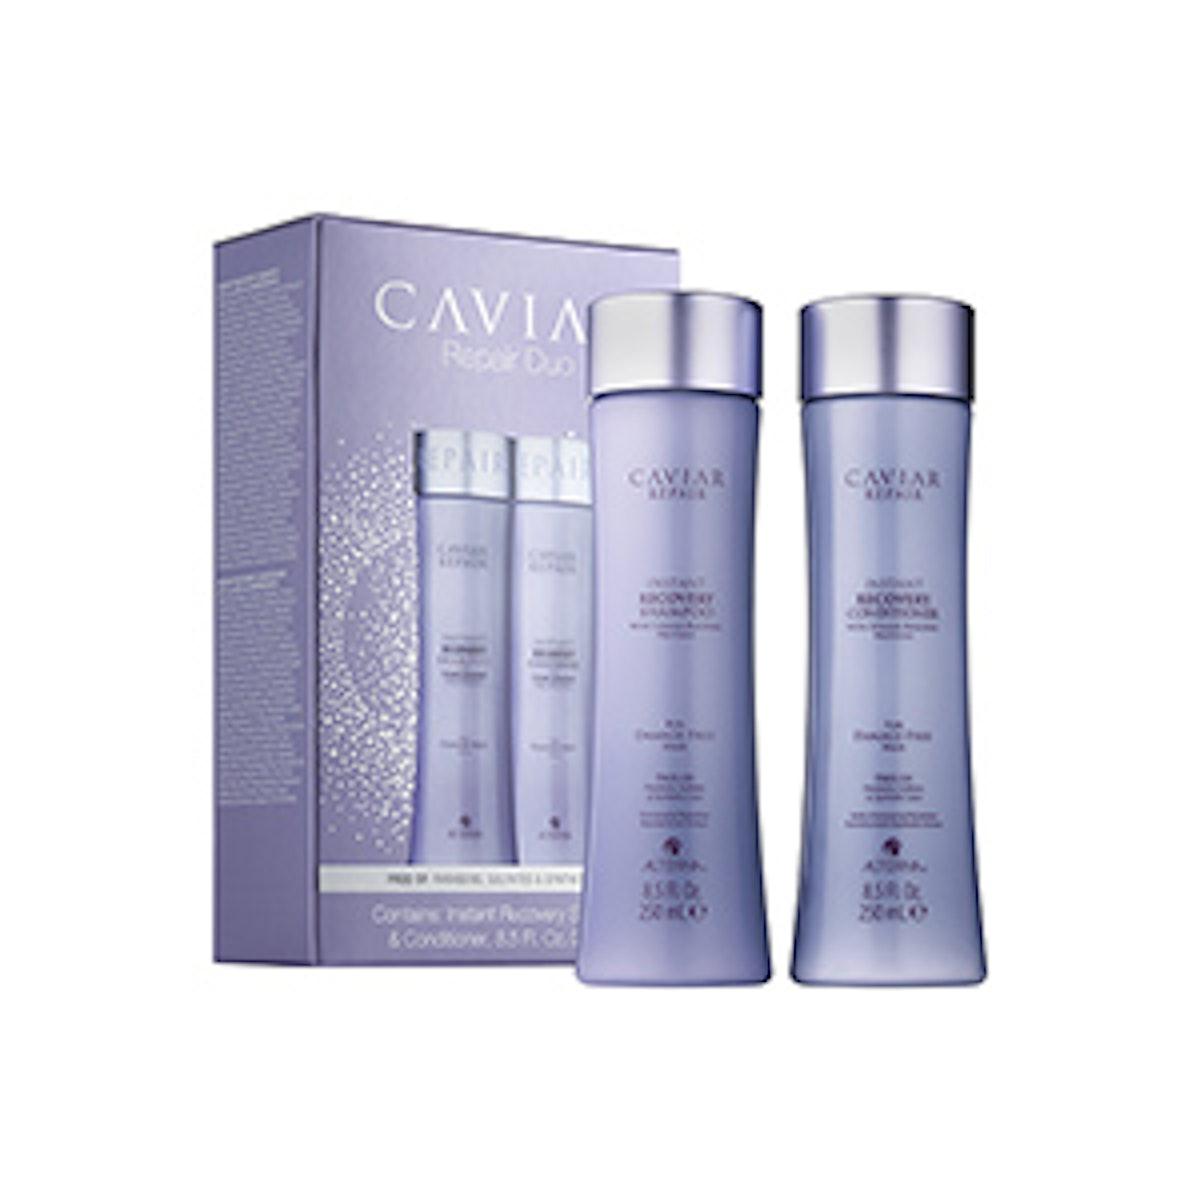 Caviar Repair Duo Kit